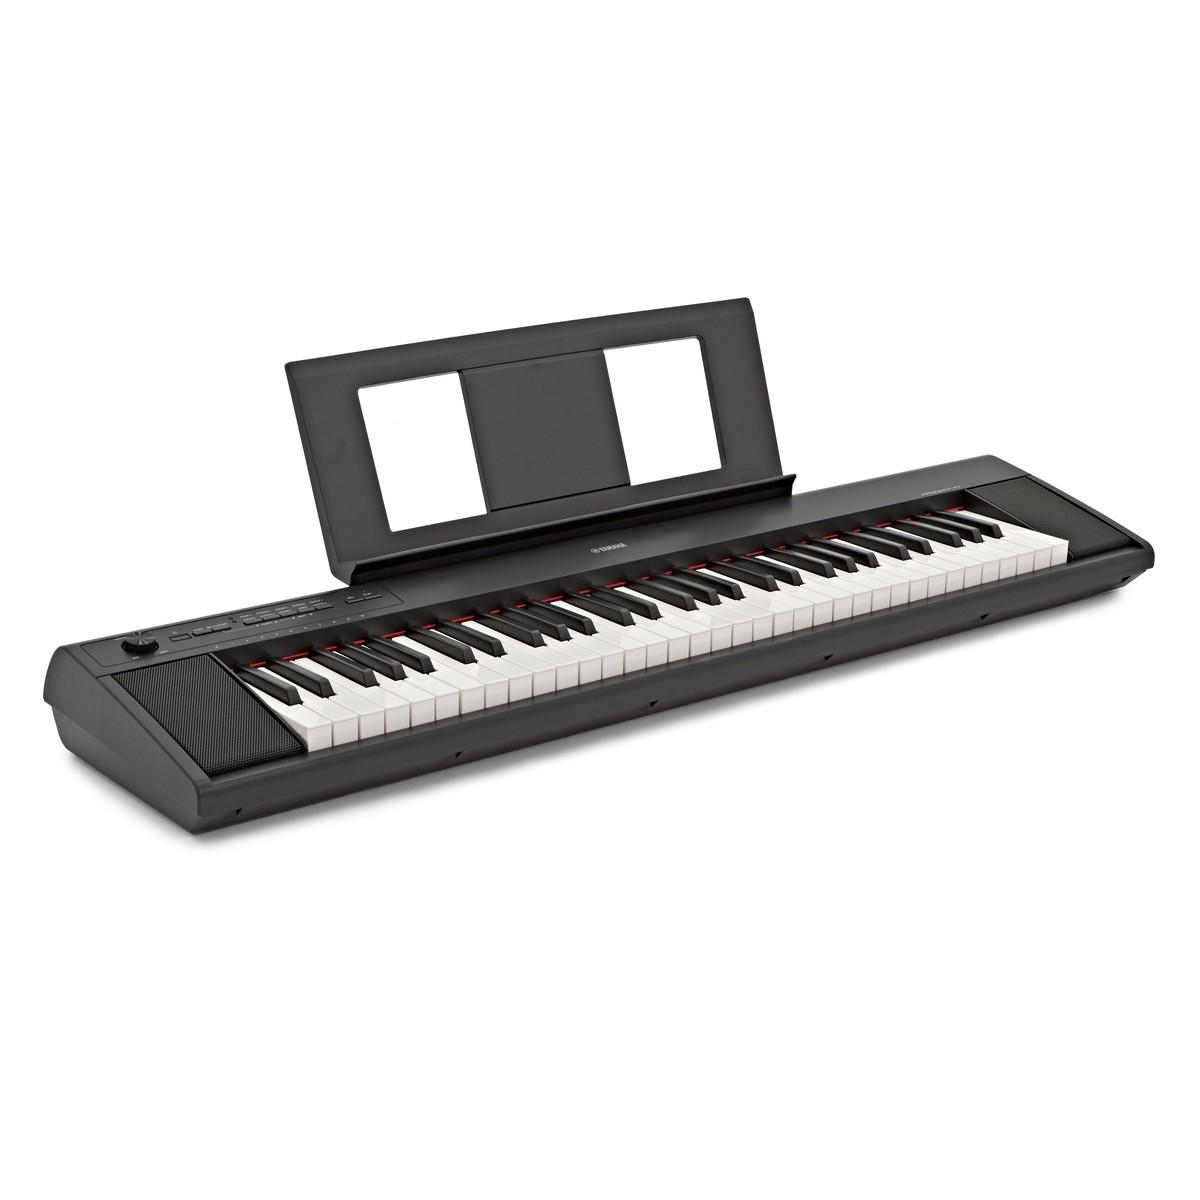 Yamaha Piaggero Np12 : yamaha piaggero np12 portable digital piano black at gear4music ~ Vivirlamusica.com Haus und Dekorationen